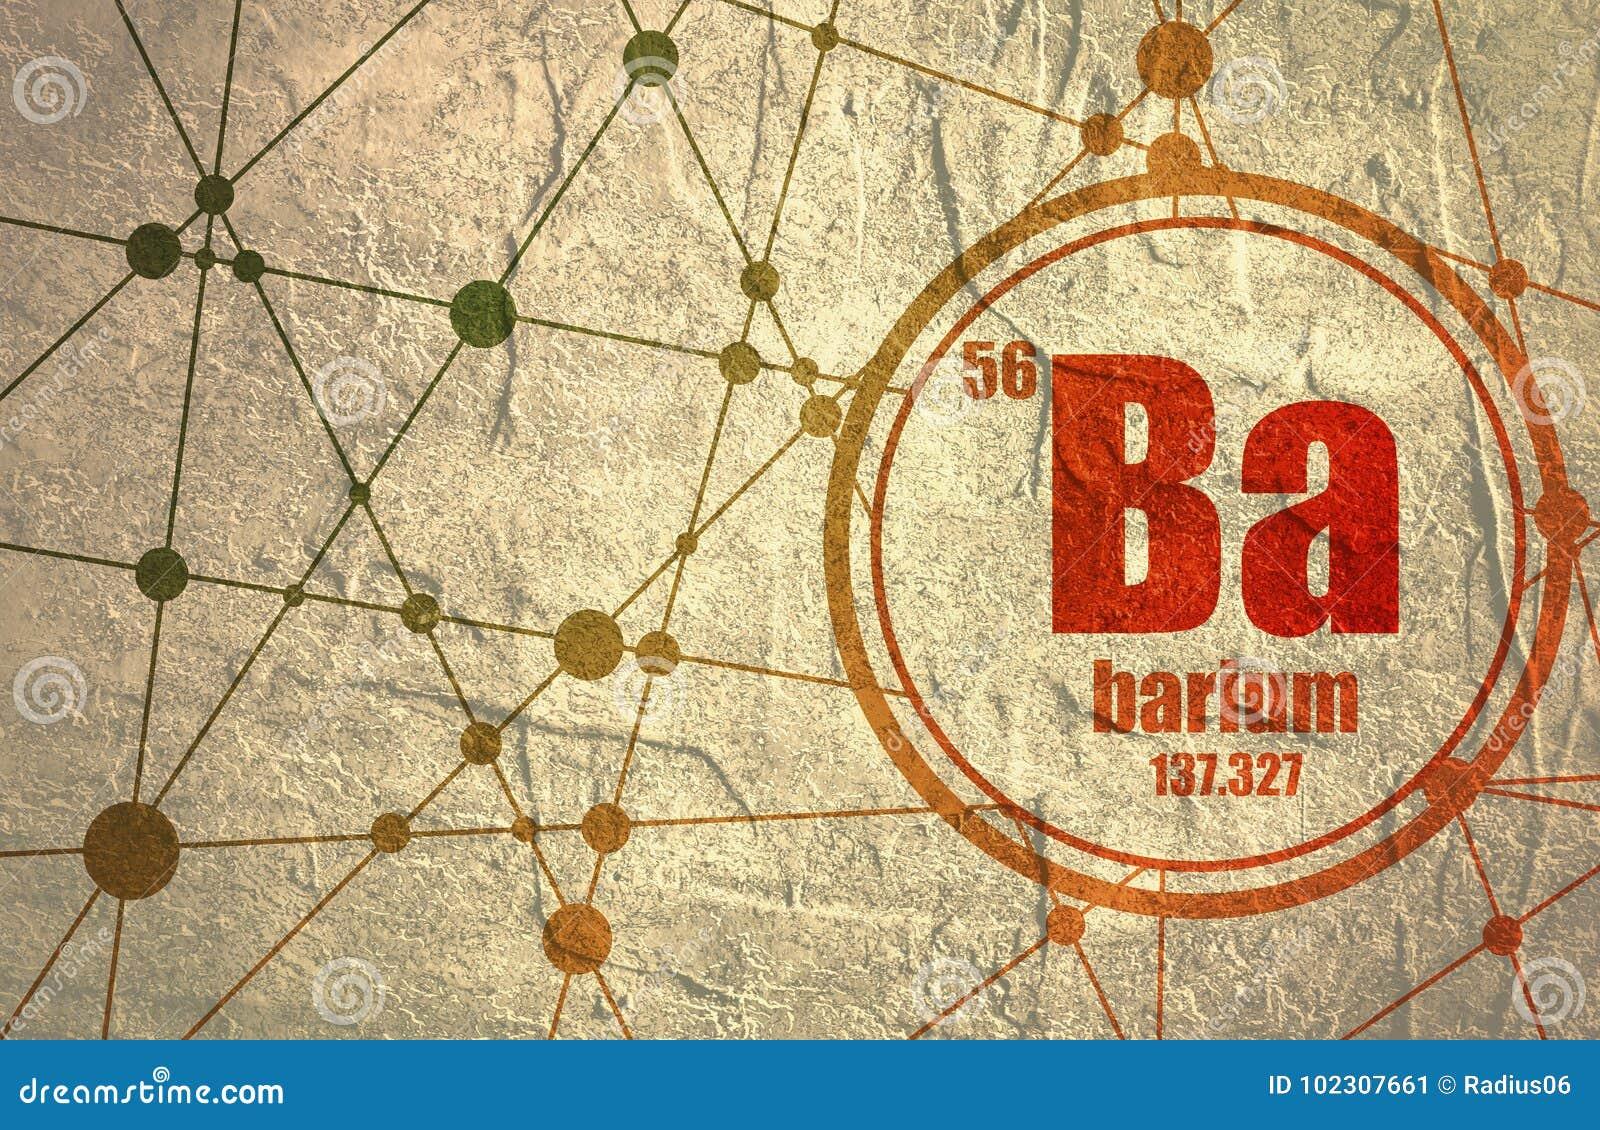 Barium Chemical Element Stock Illustration Illustration Of